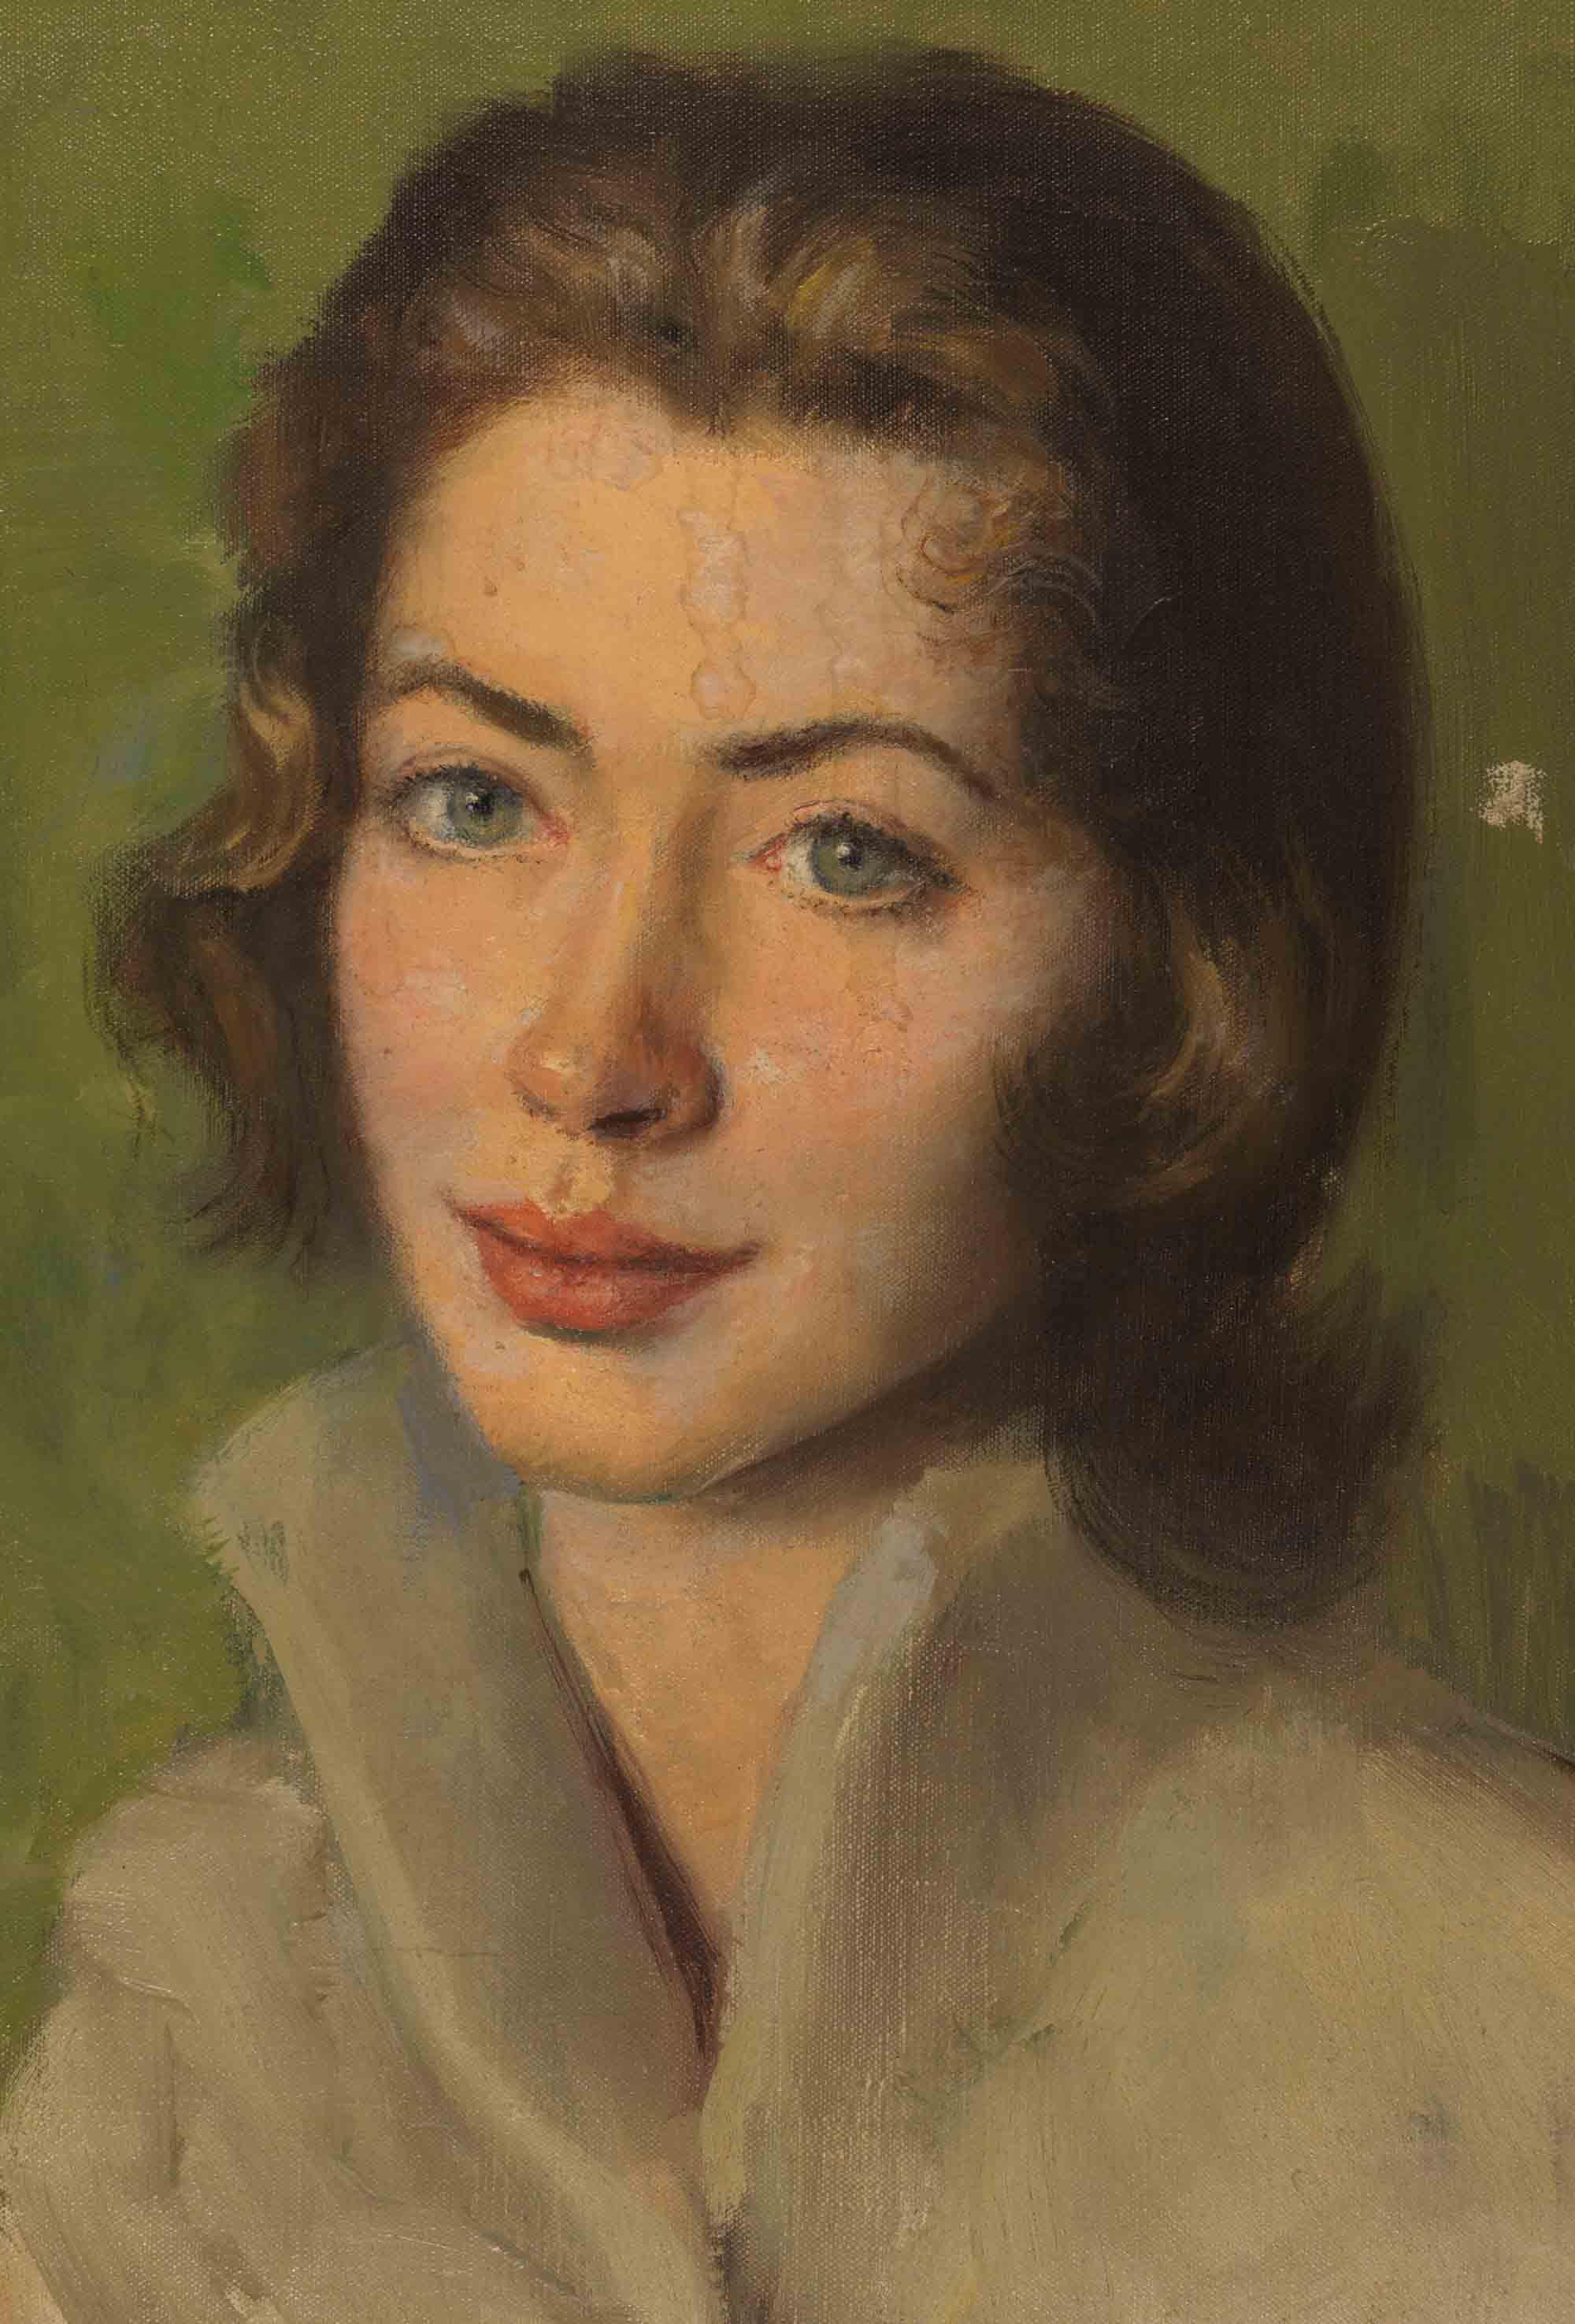 Anthony Devas, Alice, c.1956, Oil on Canvas, 16 x 12 inches. Ref: R/AeroGirls. Borthwick Institute for Archives. Copyright Nestlé UK.